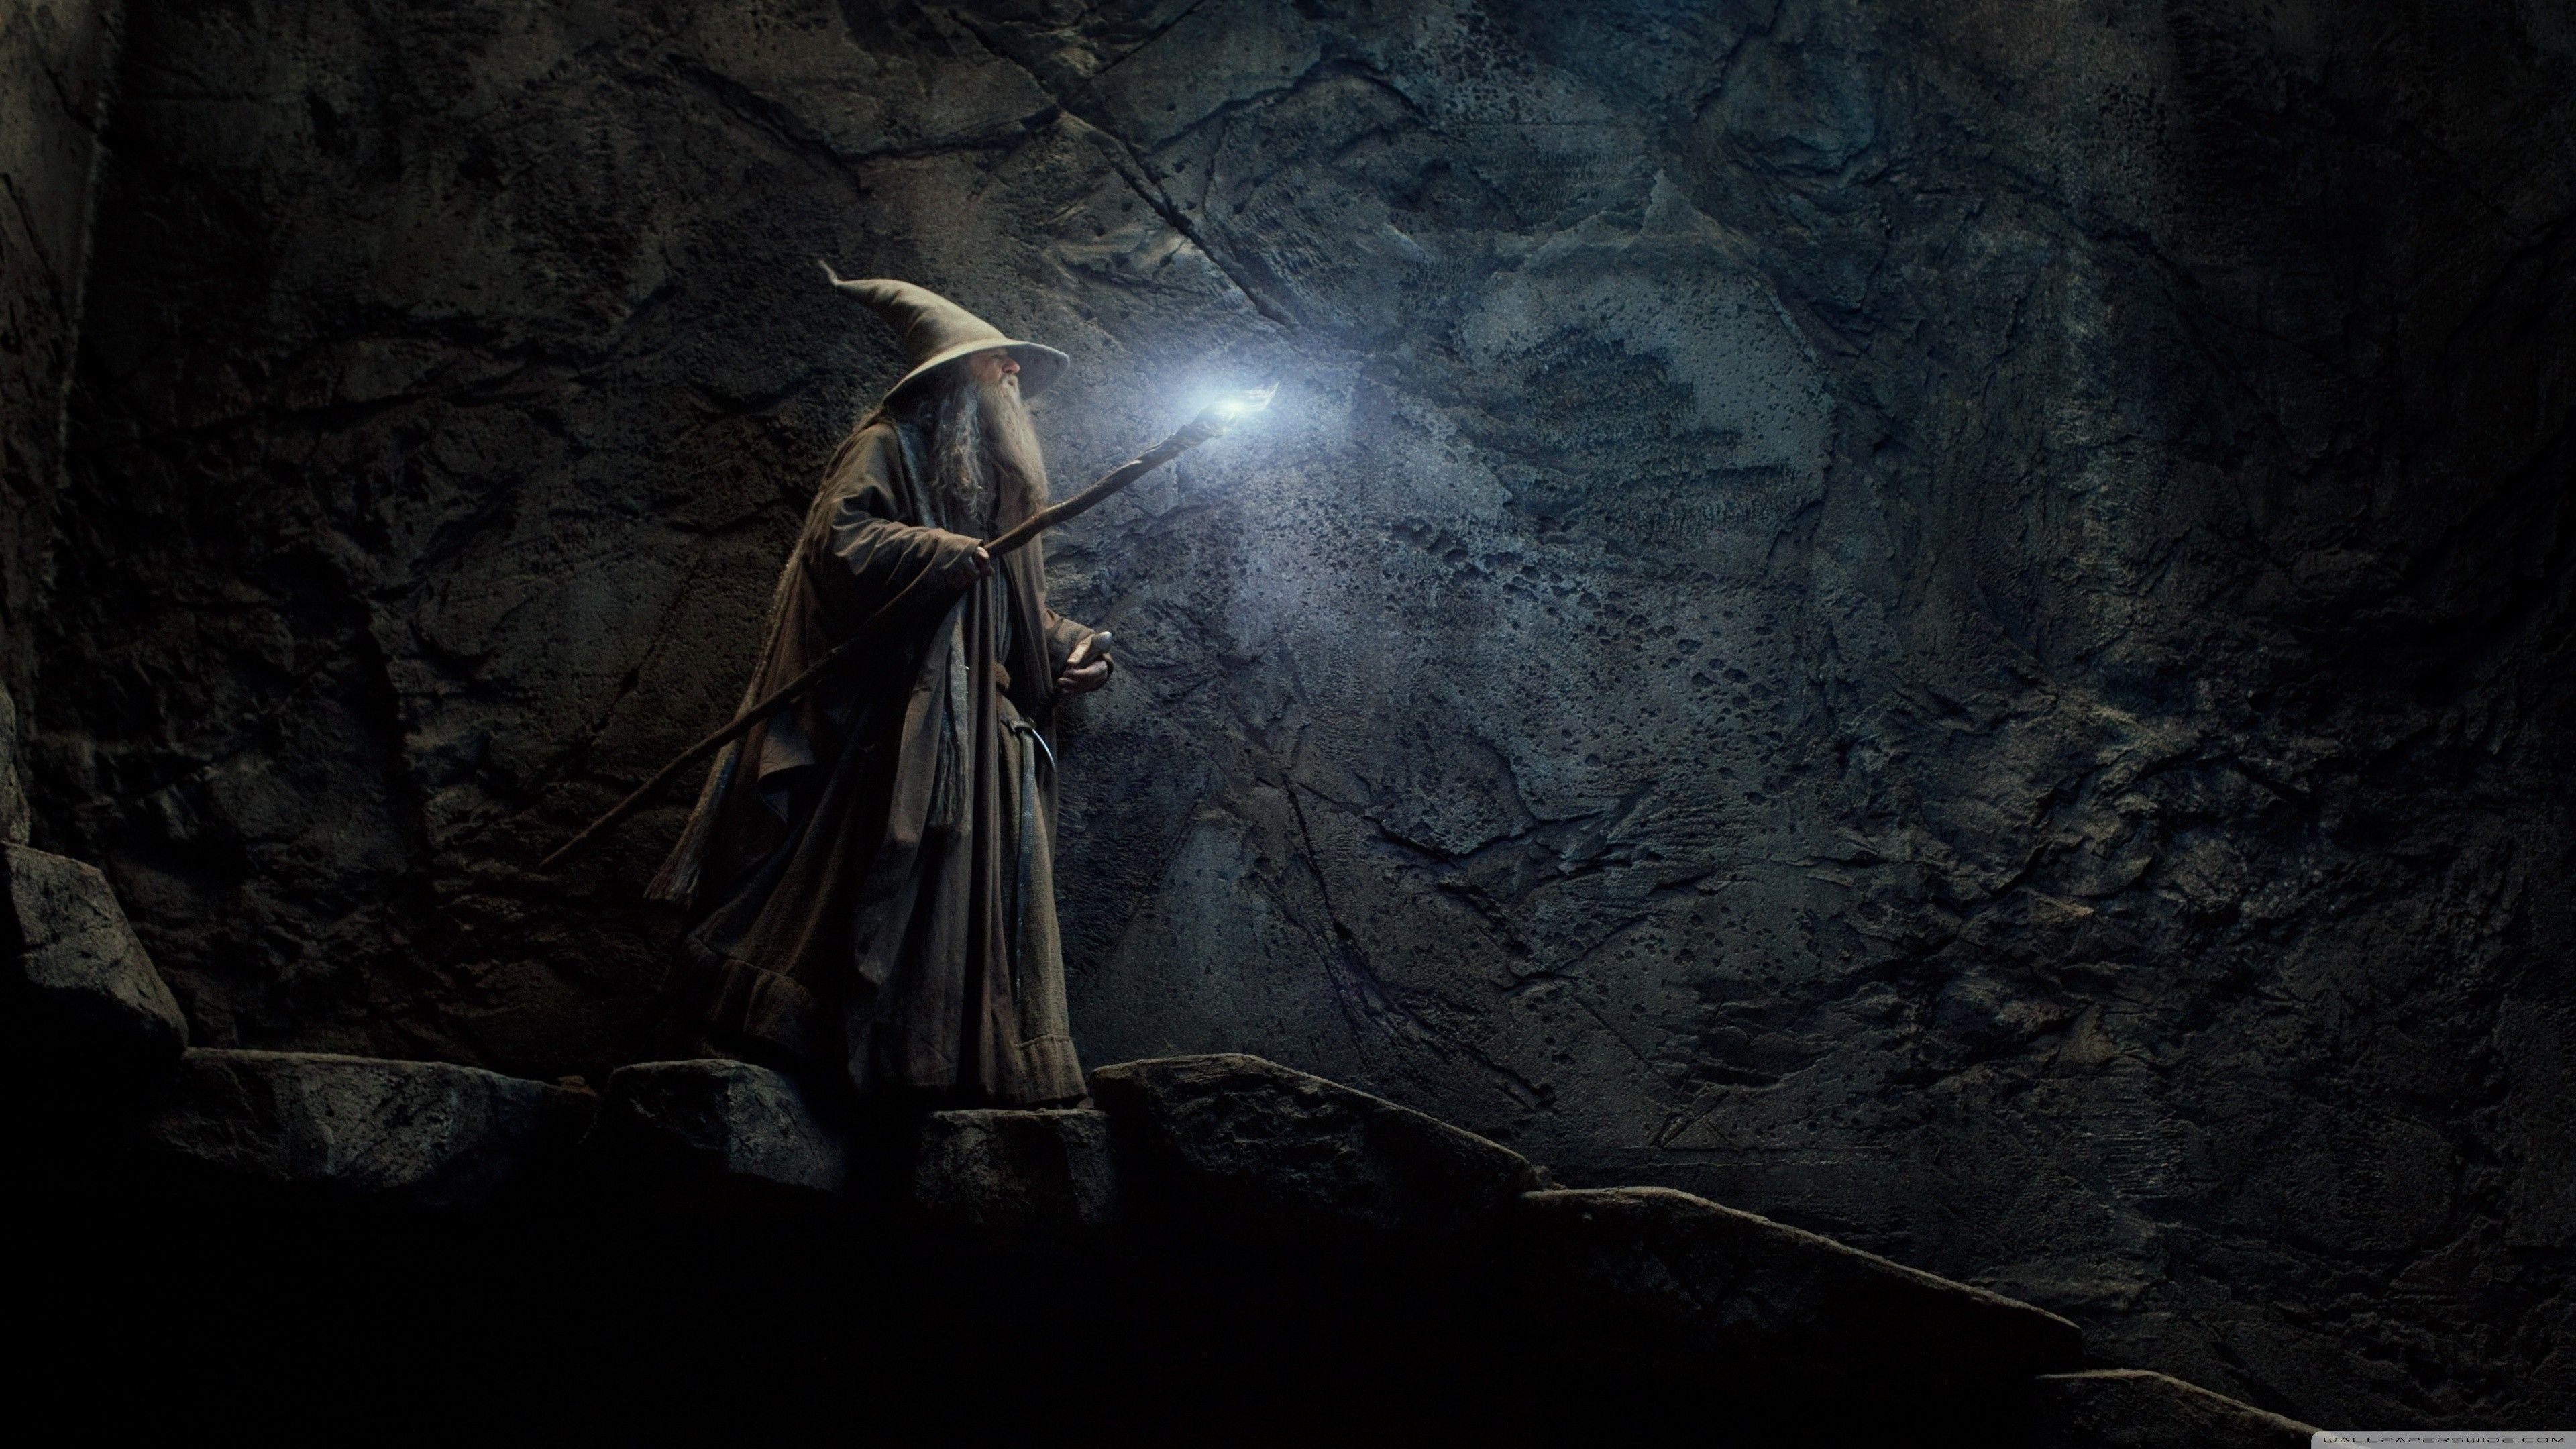 4k Desktop Gandalf Wallpapers Wallpaper Cave